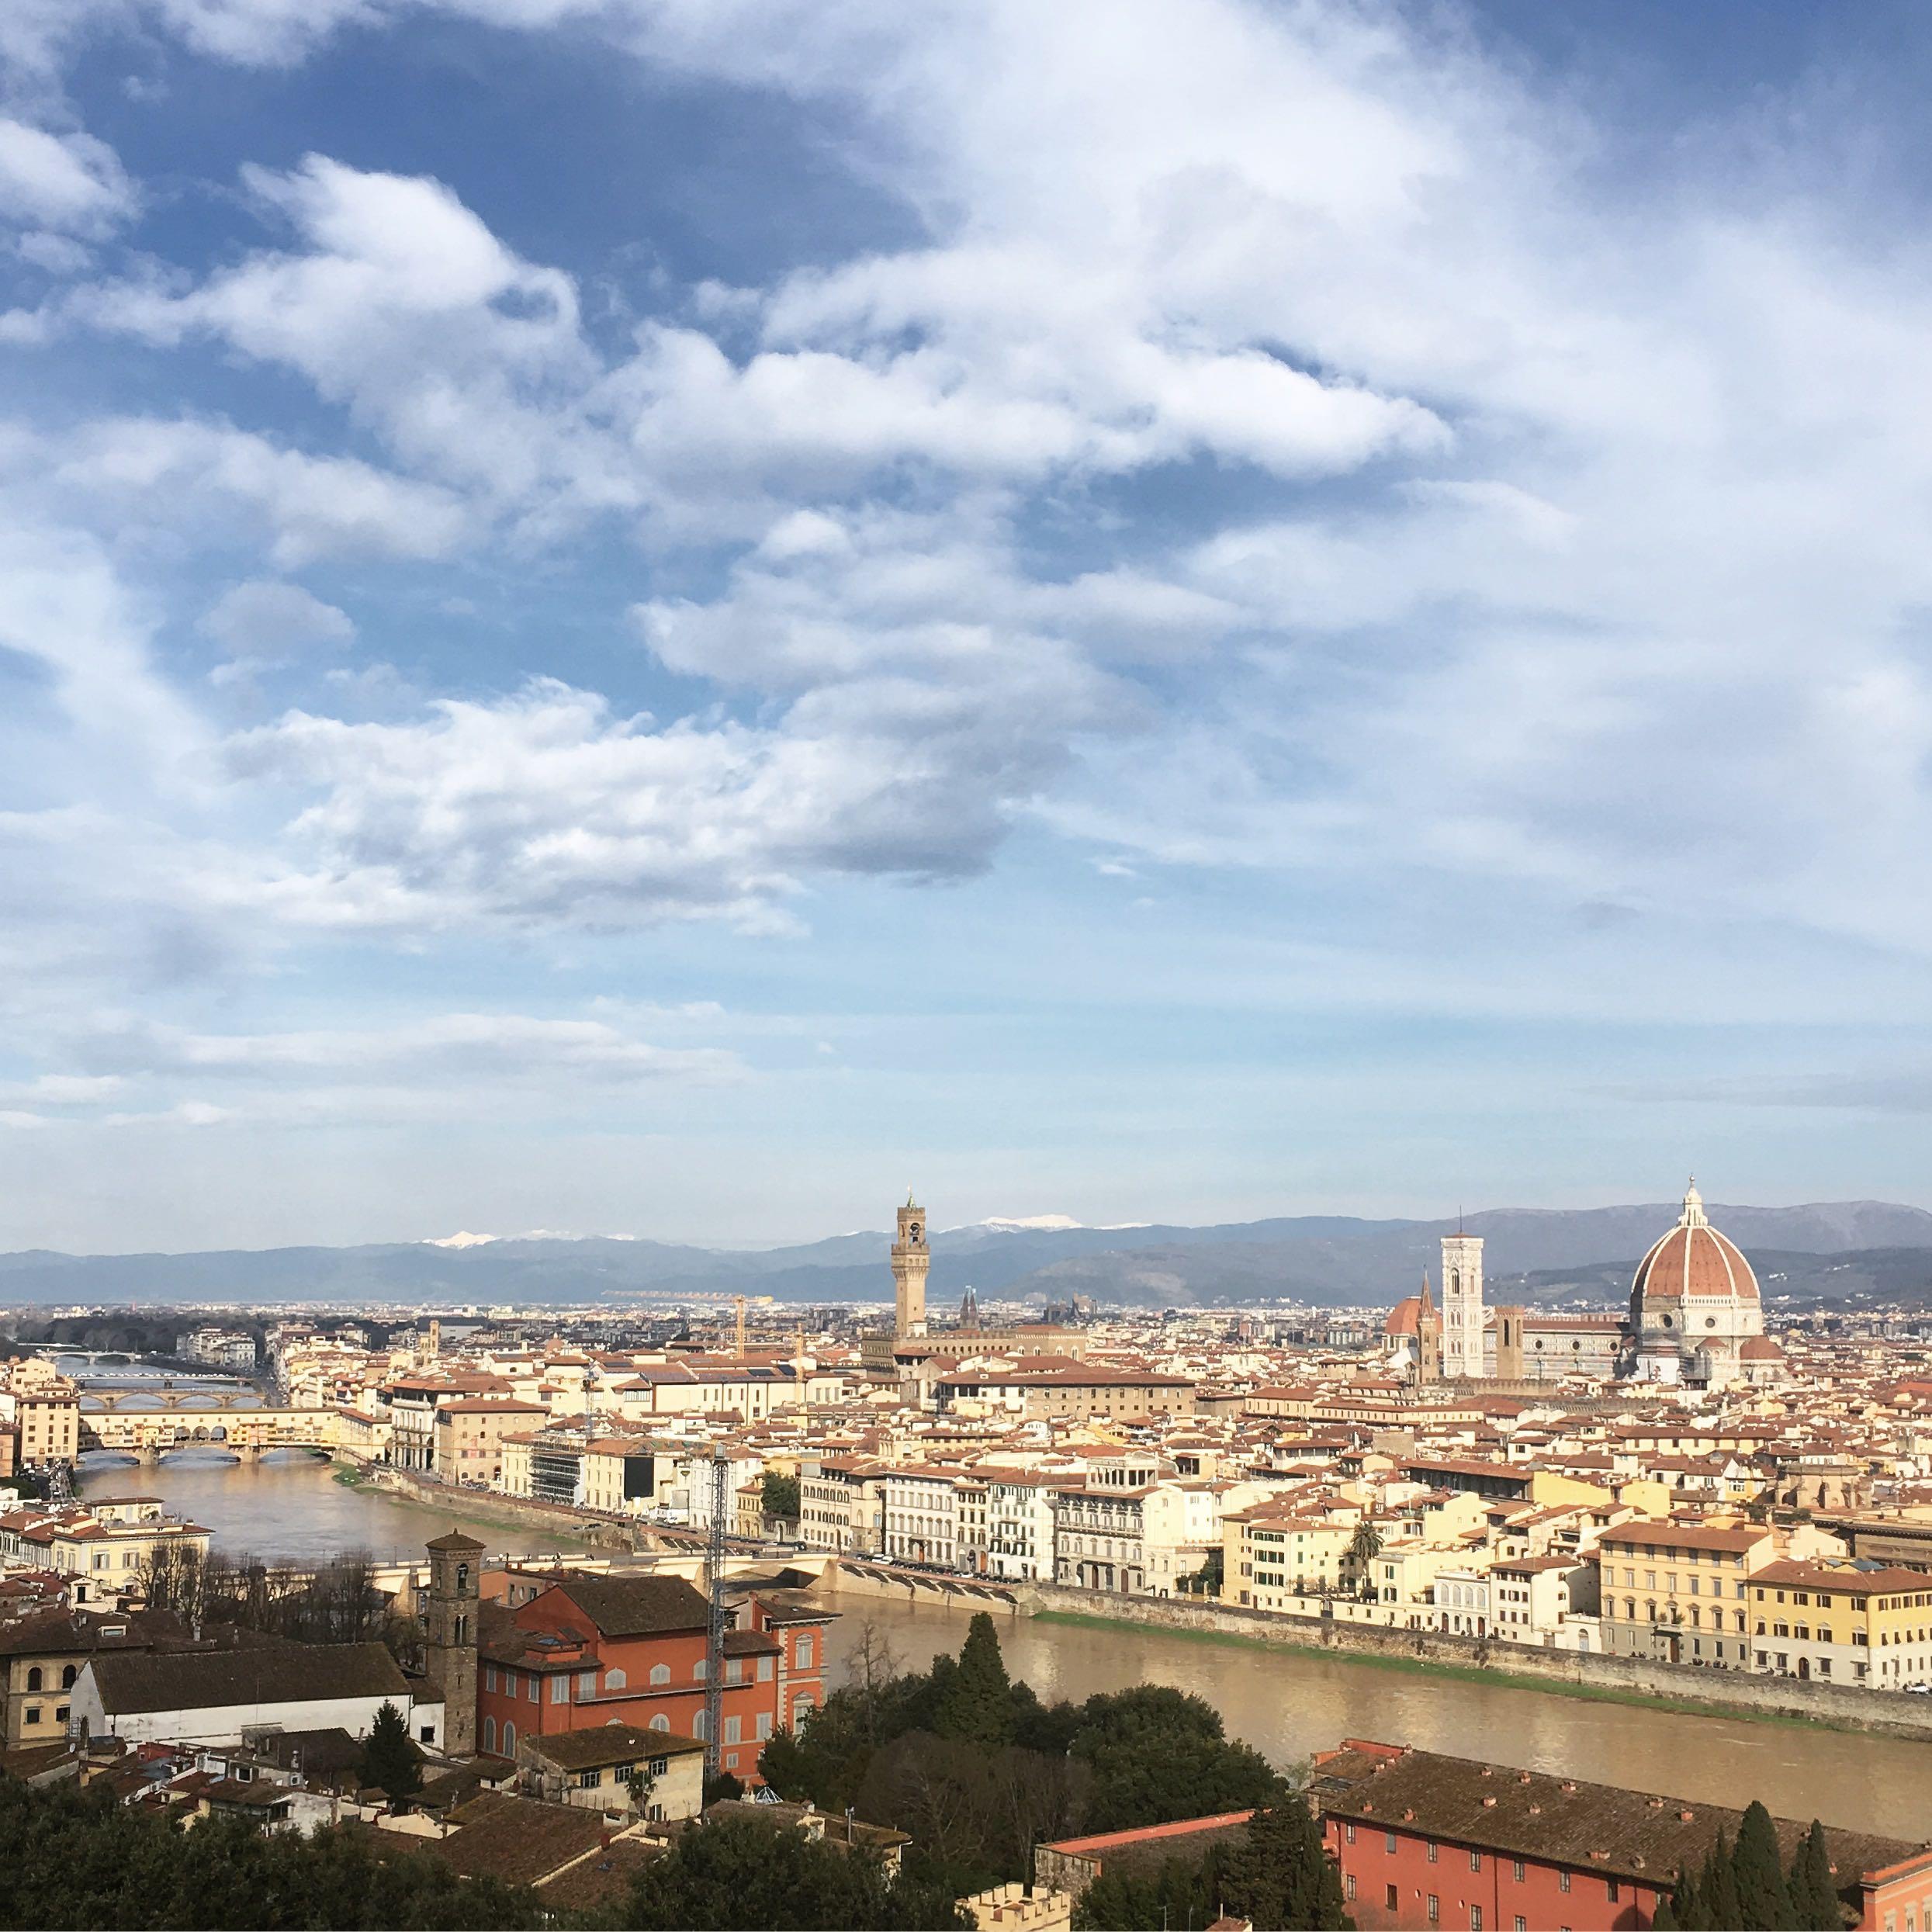 Lozidaze_Piazzale-Michelangelo_01